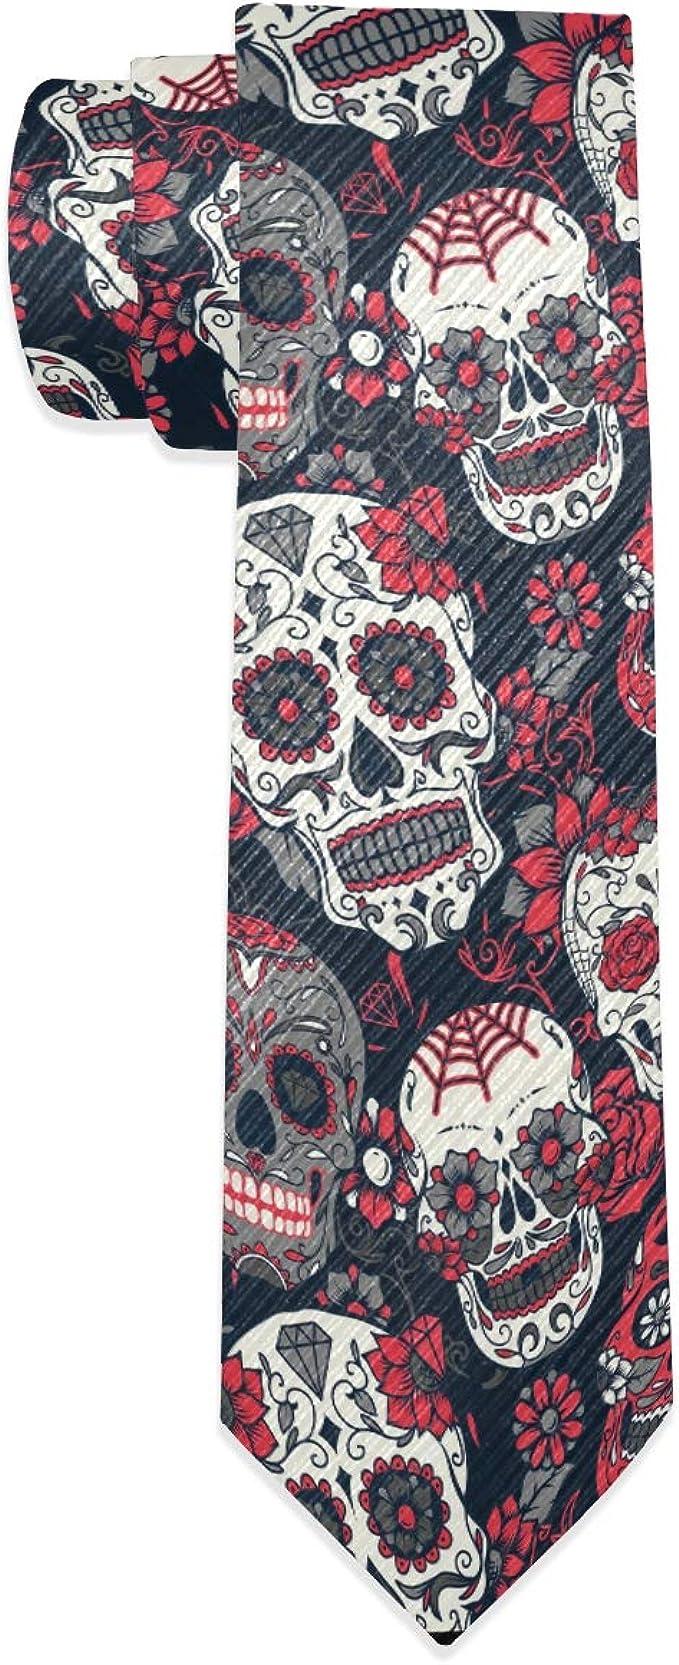 Acheter cravate tete de mort online 1